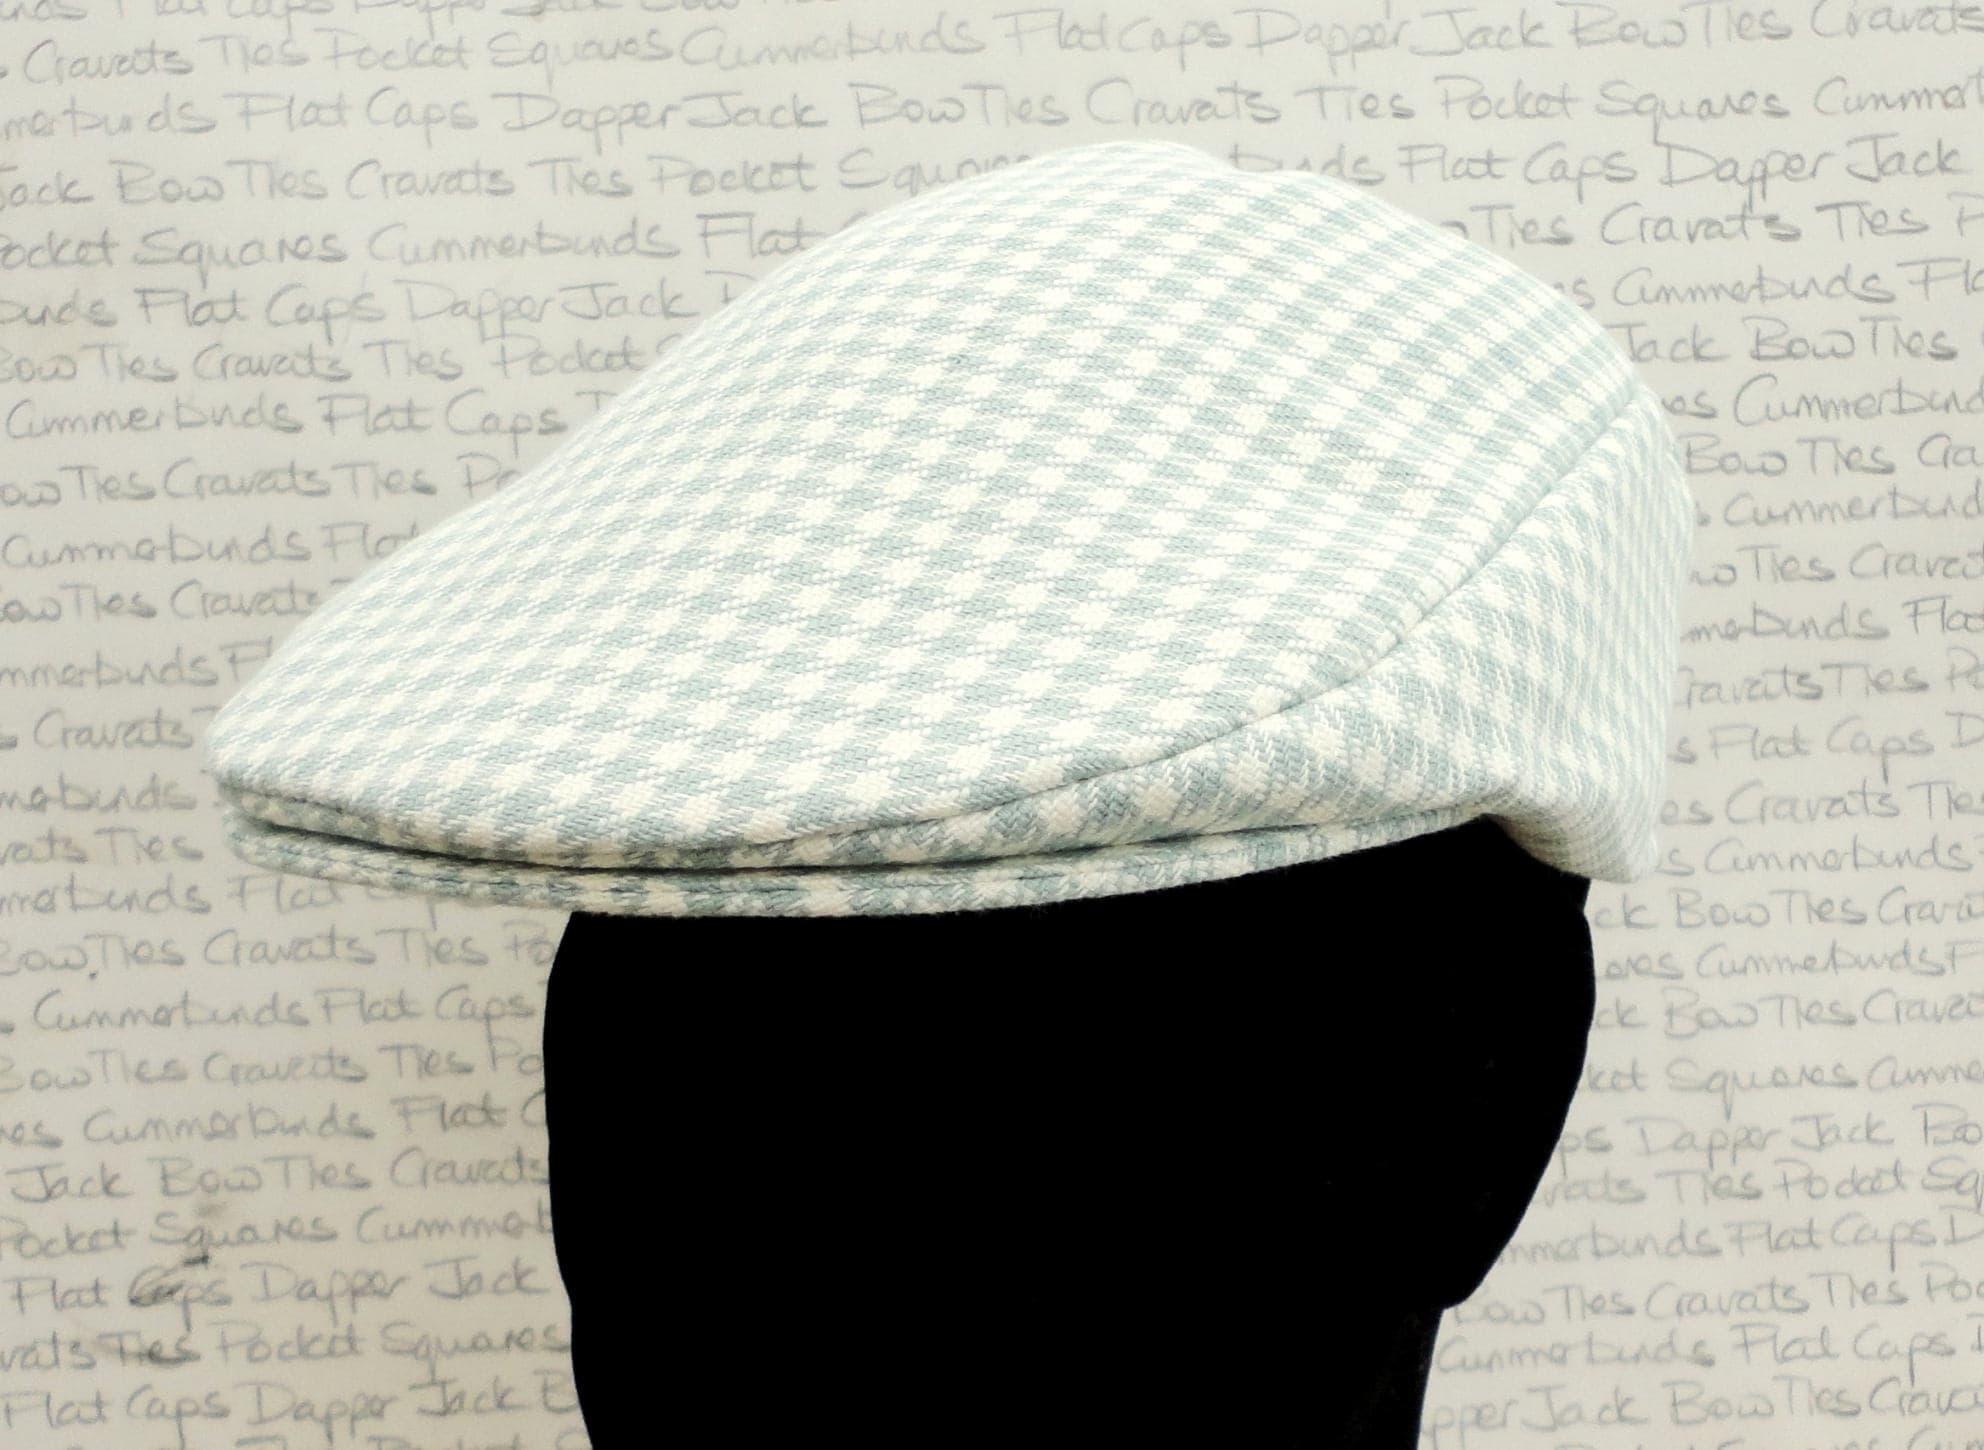 095c4a27b3 Flat Cap, houndstooth check flat cap for men